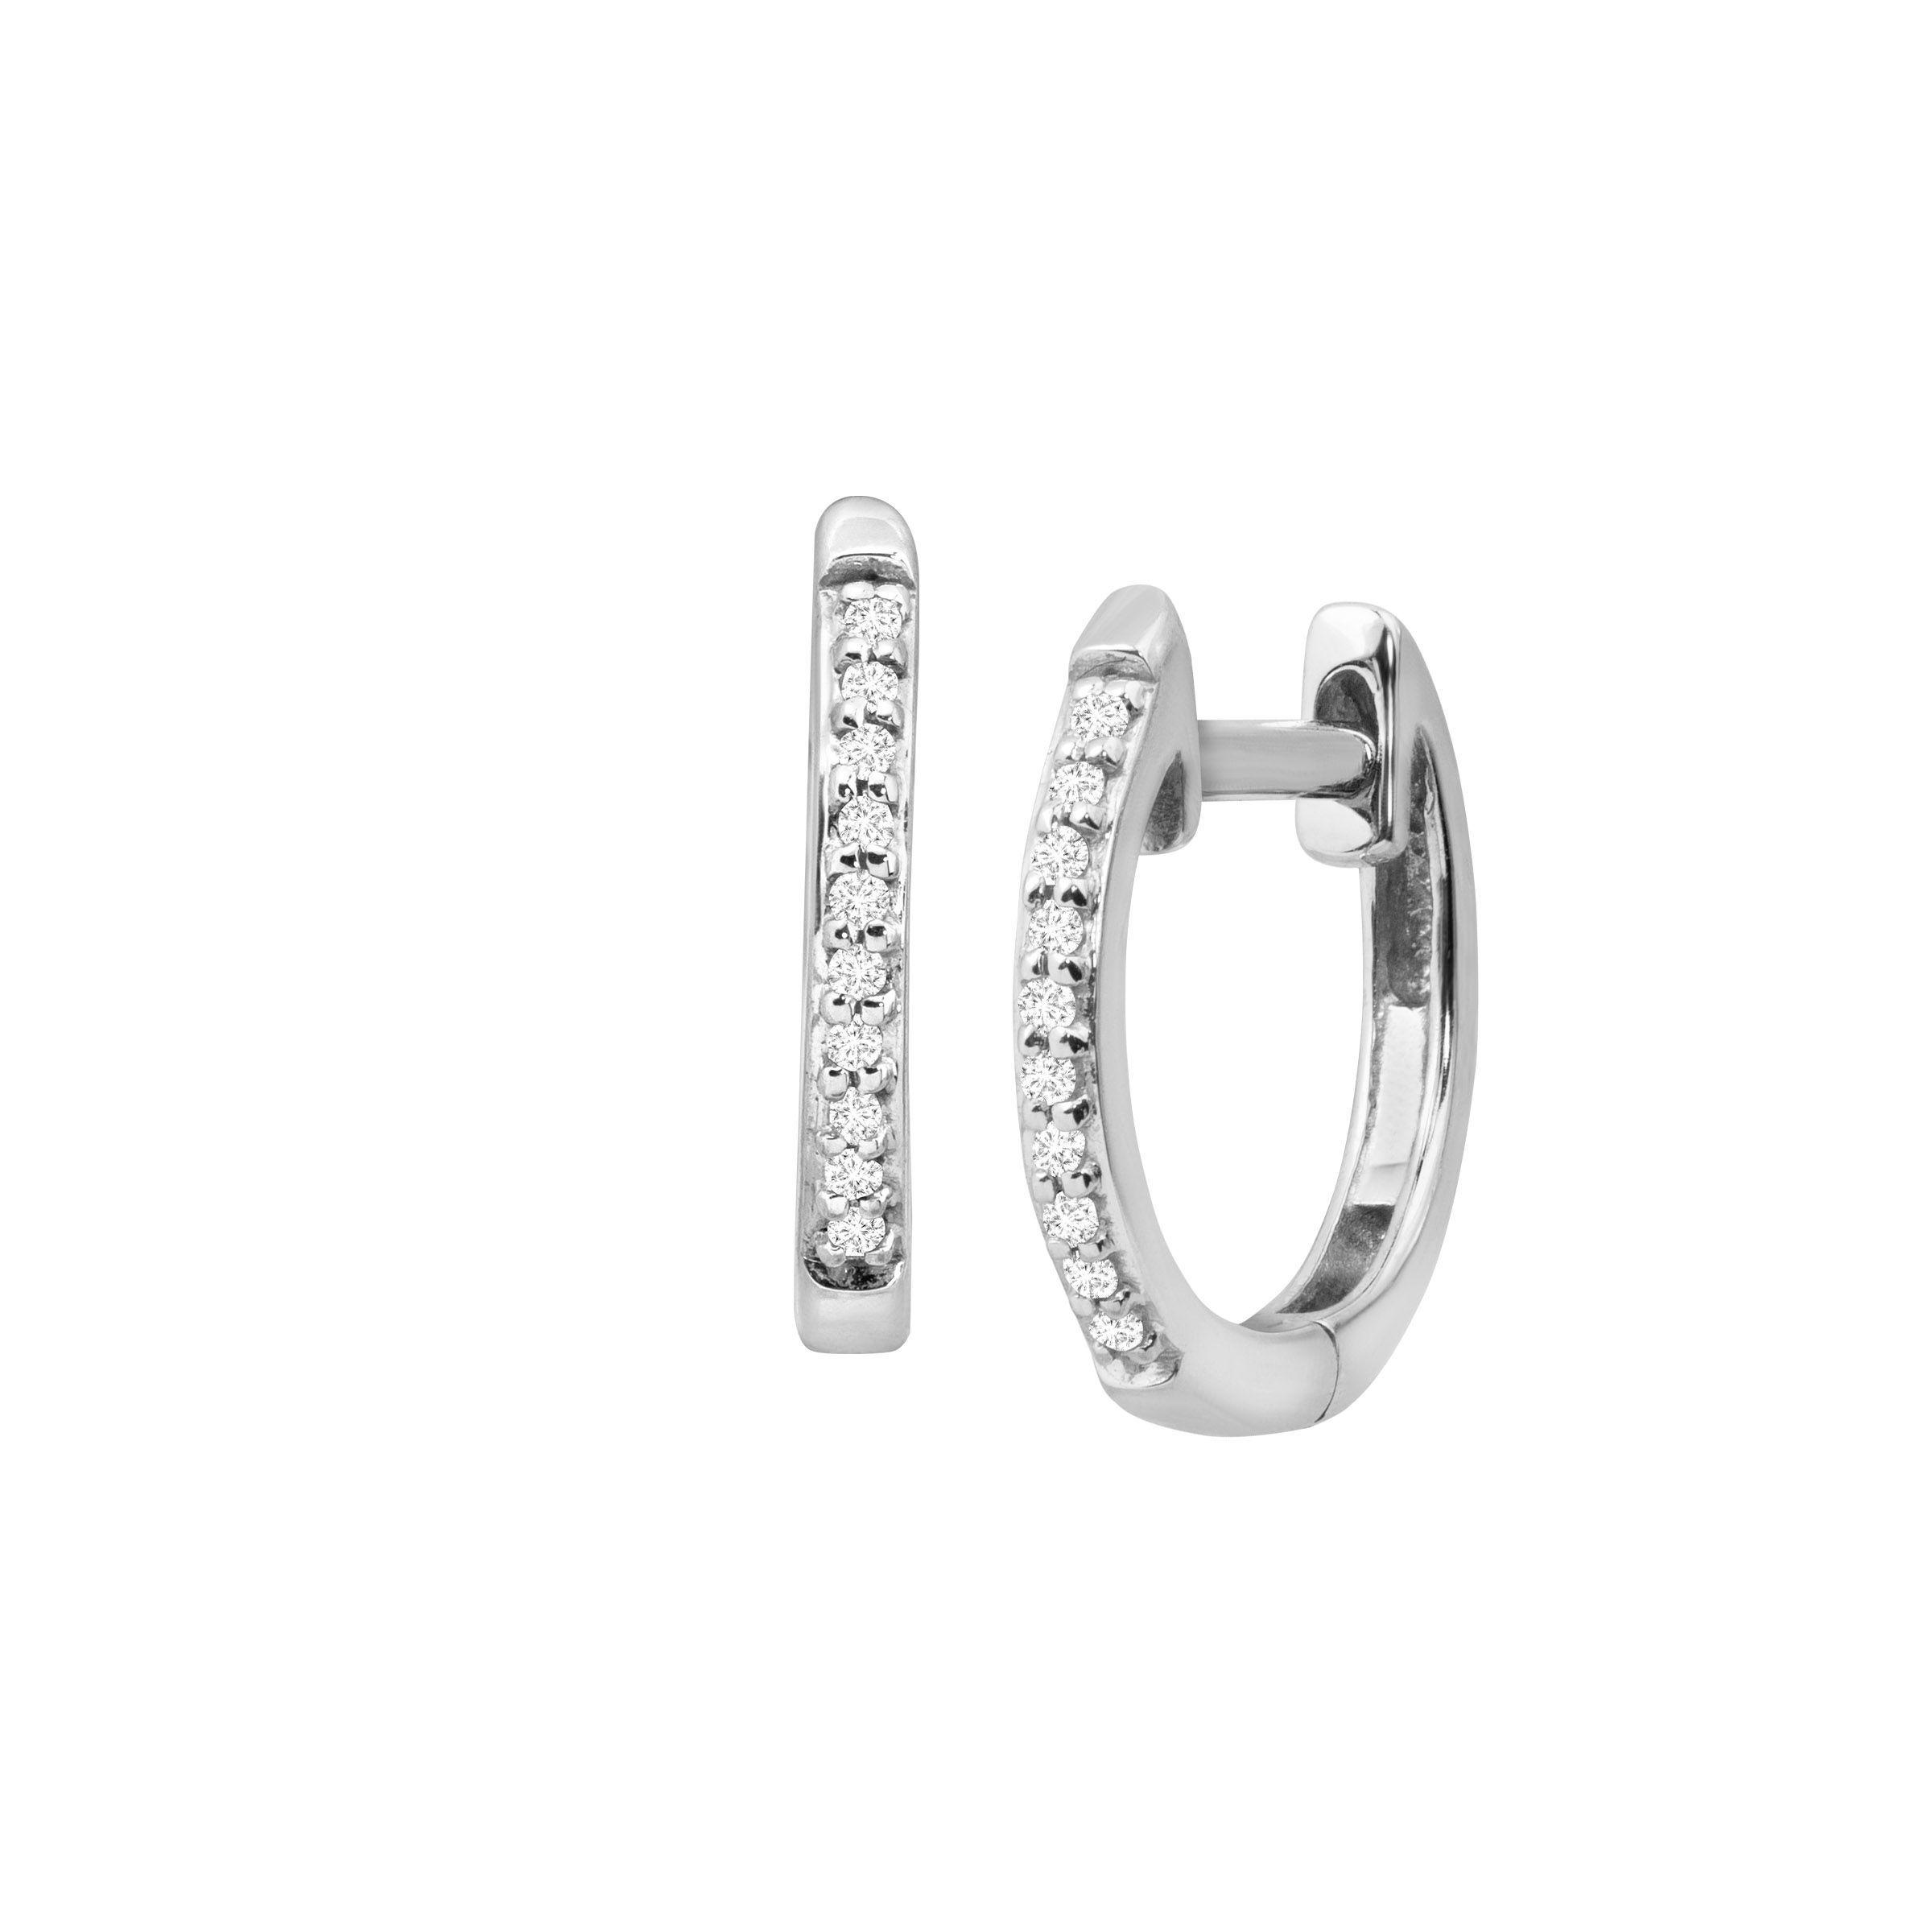 Pee Huggie Hoop Earrings With Diamond Accents In 10k White Gold